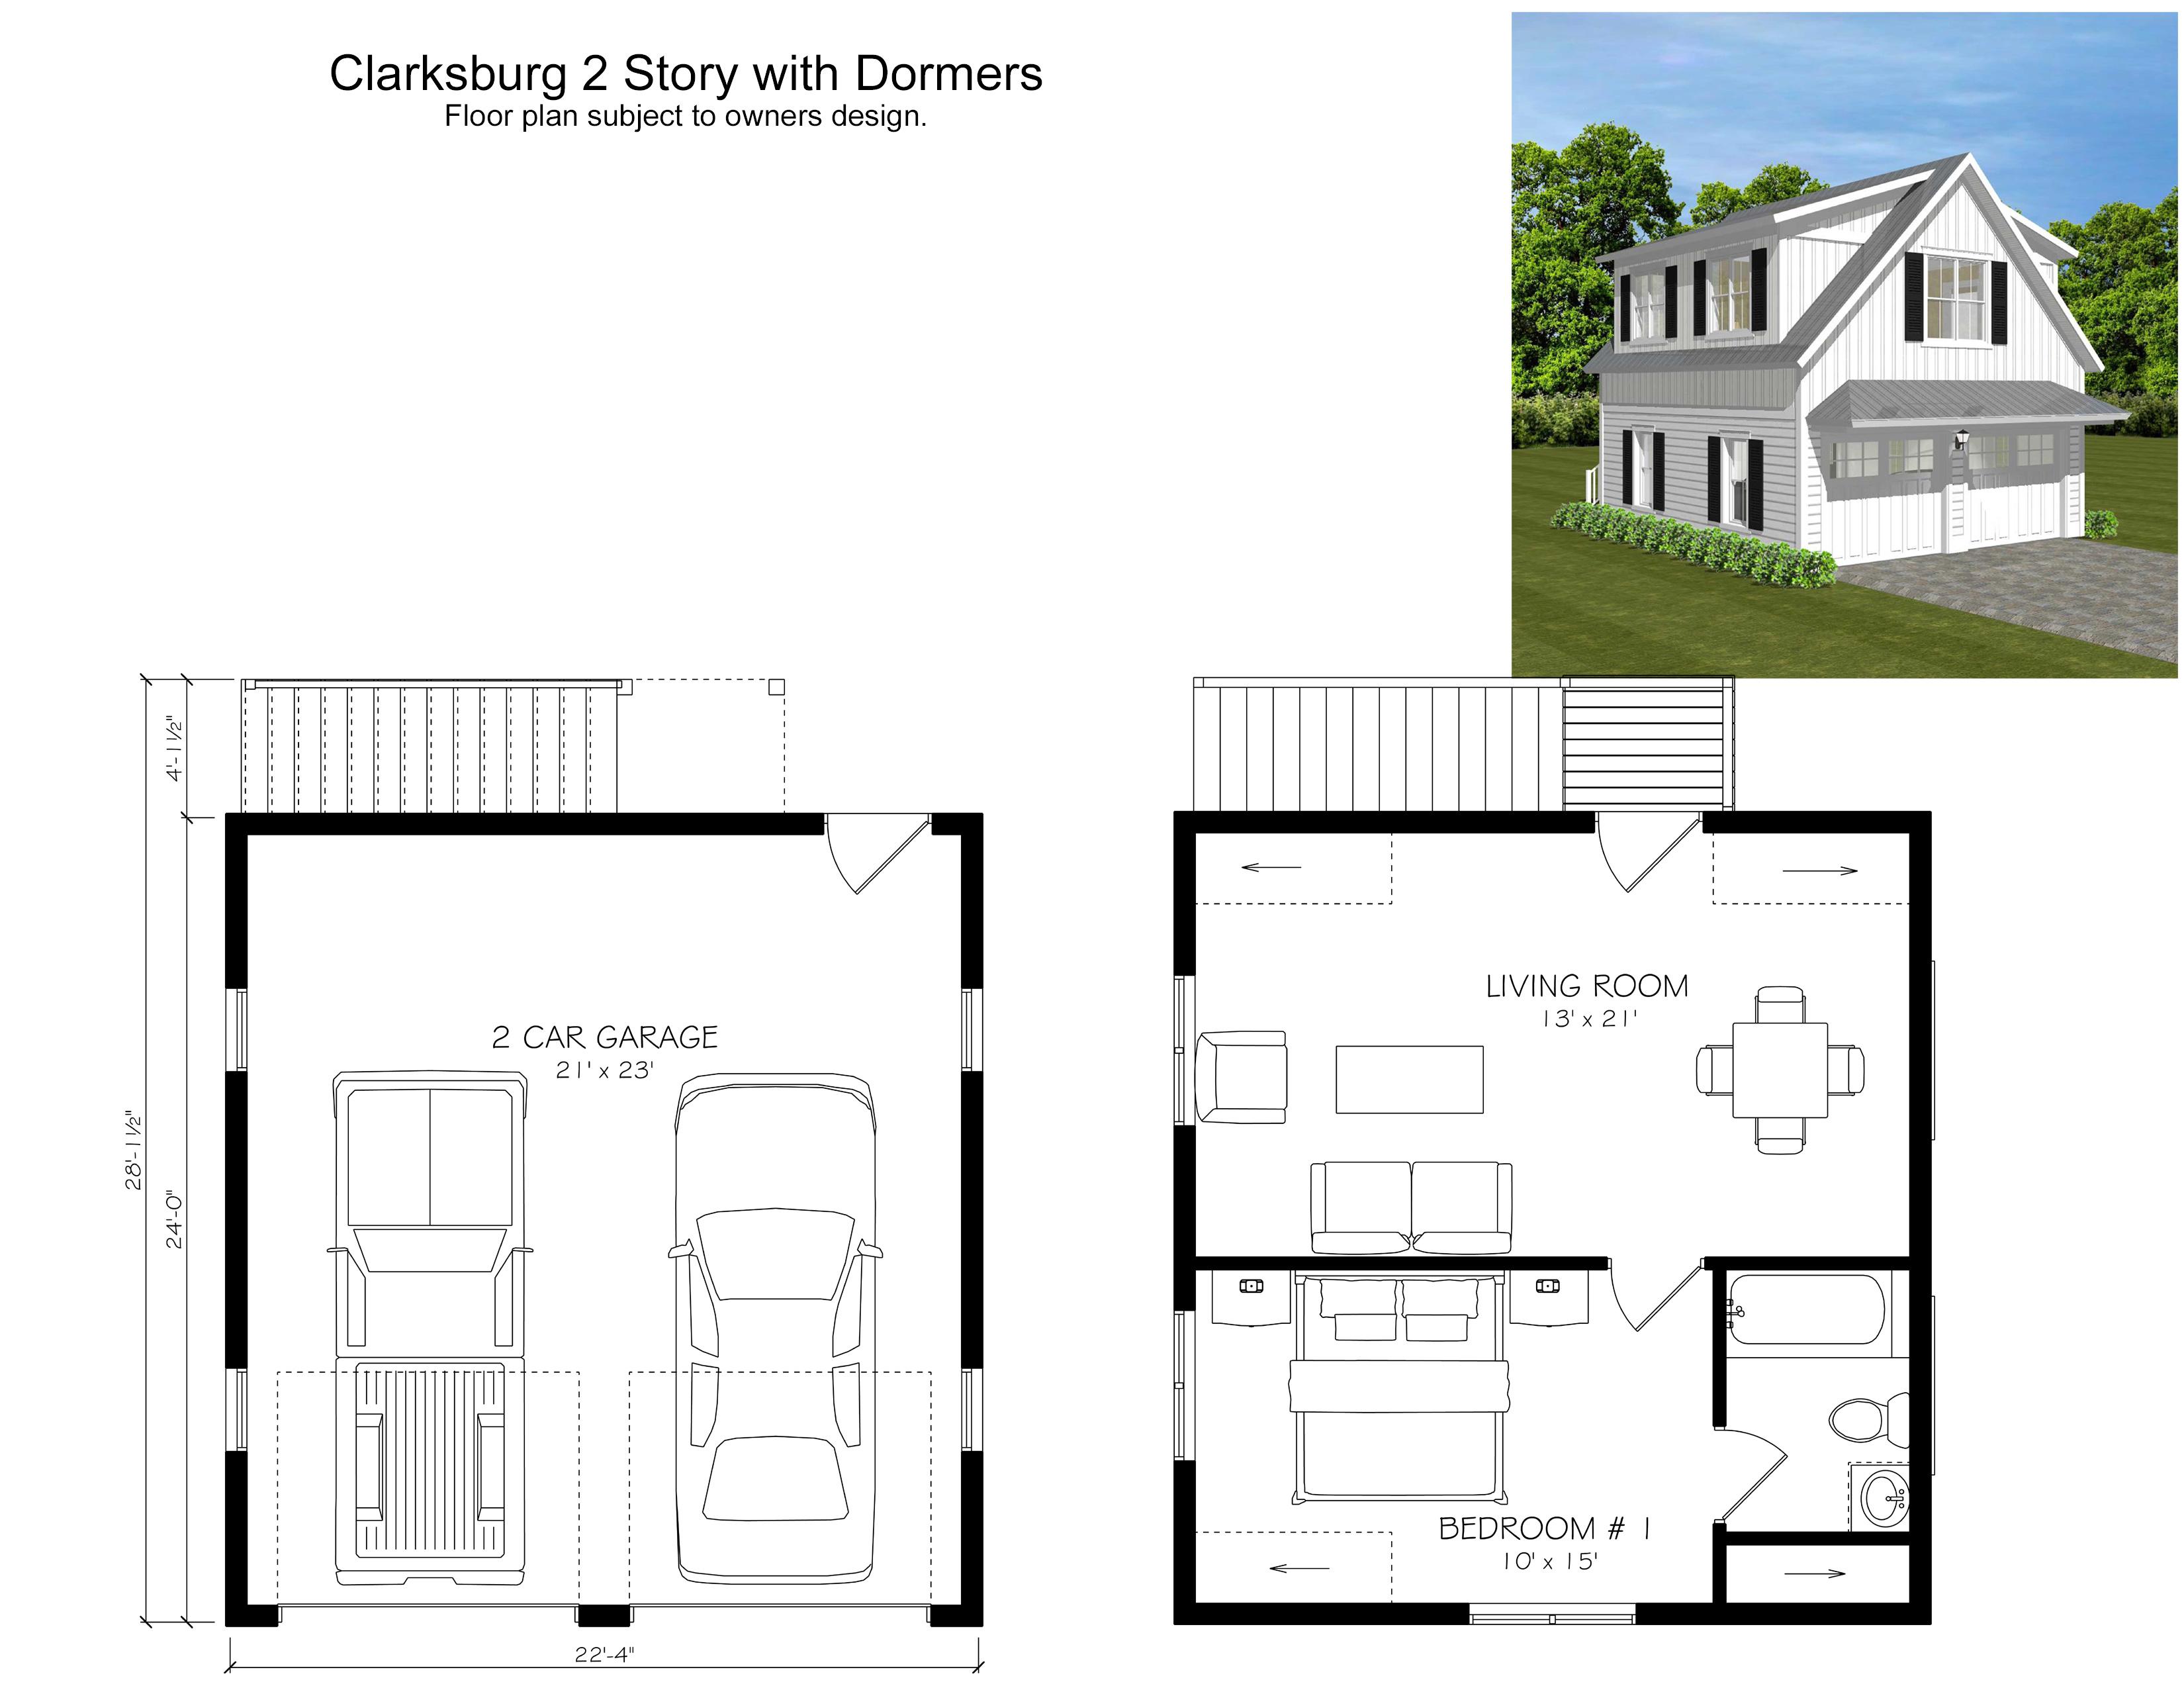 Clarksburg 2 Story with Dormers